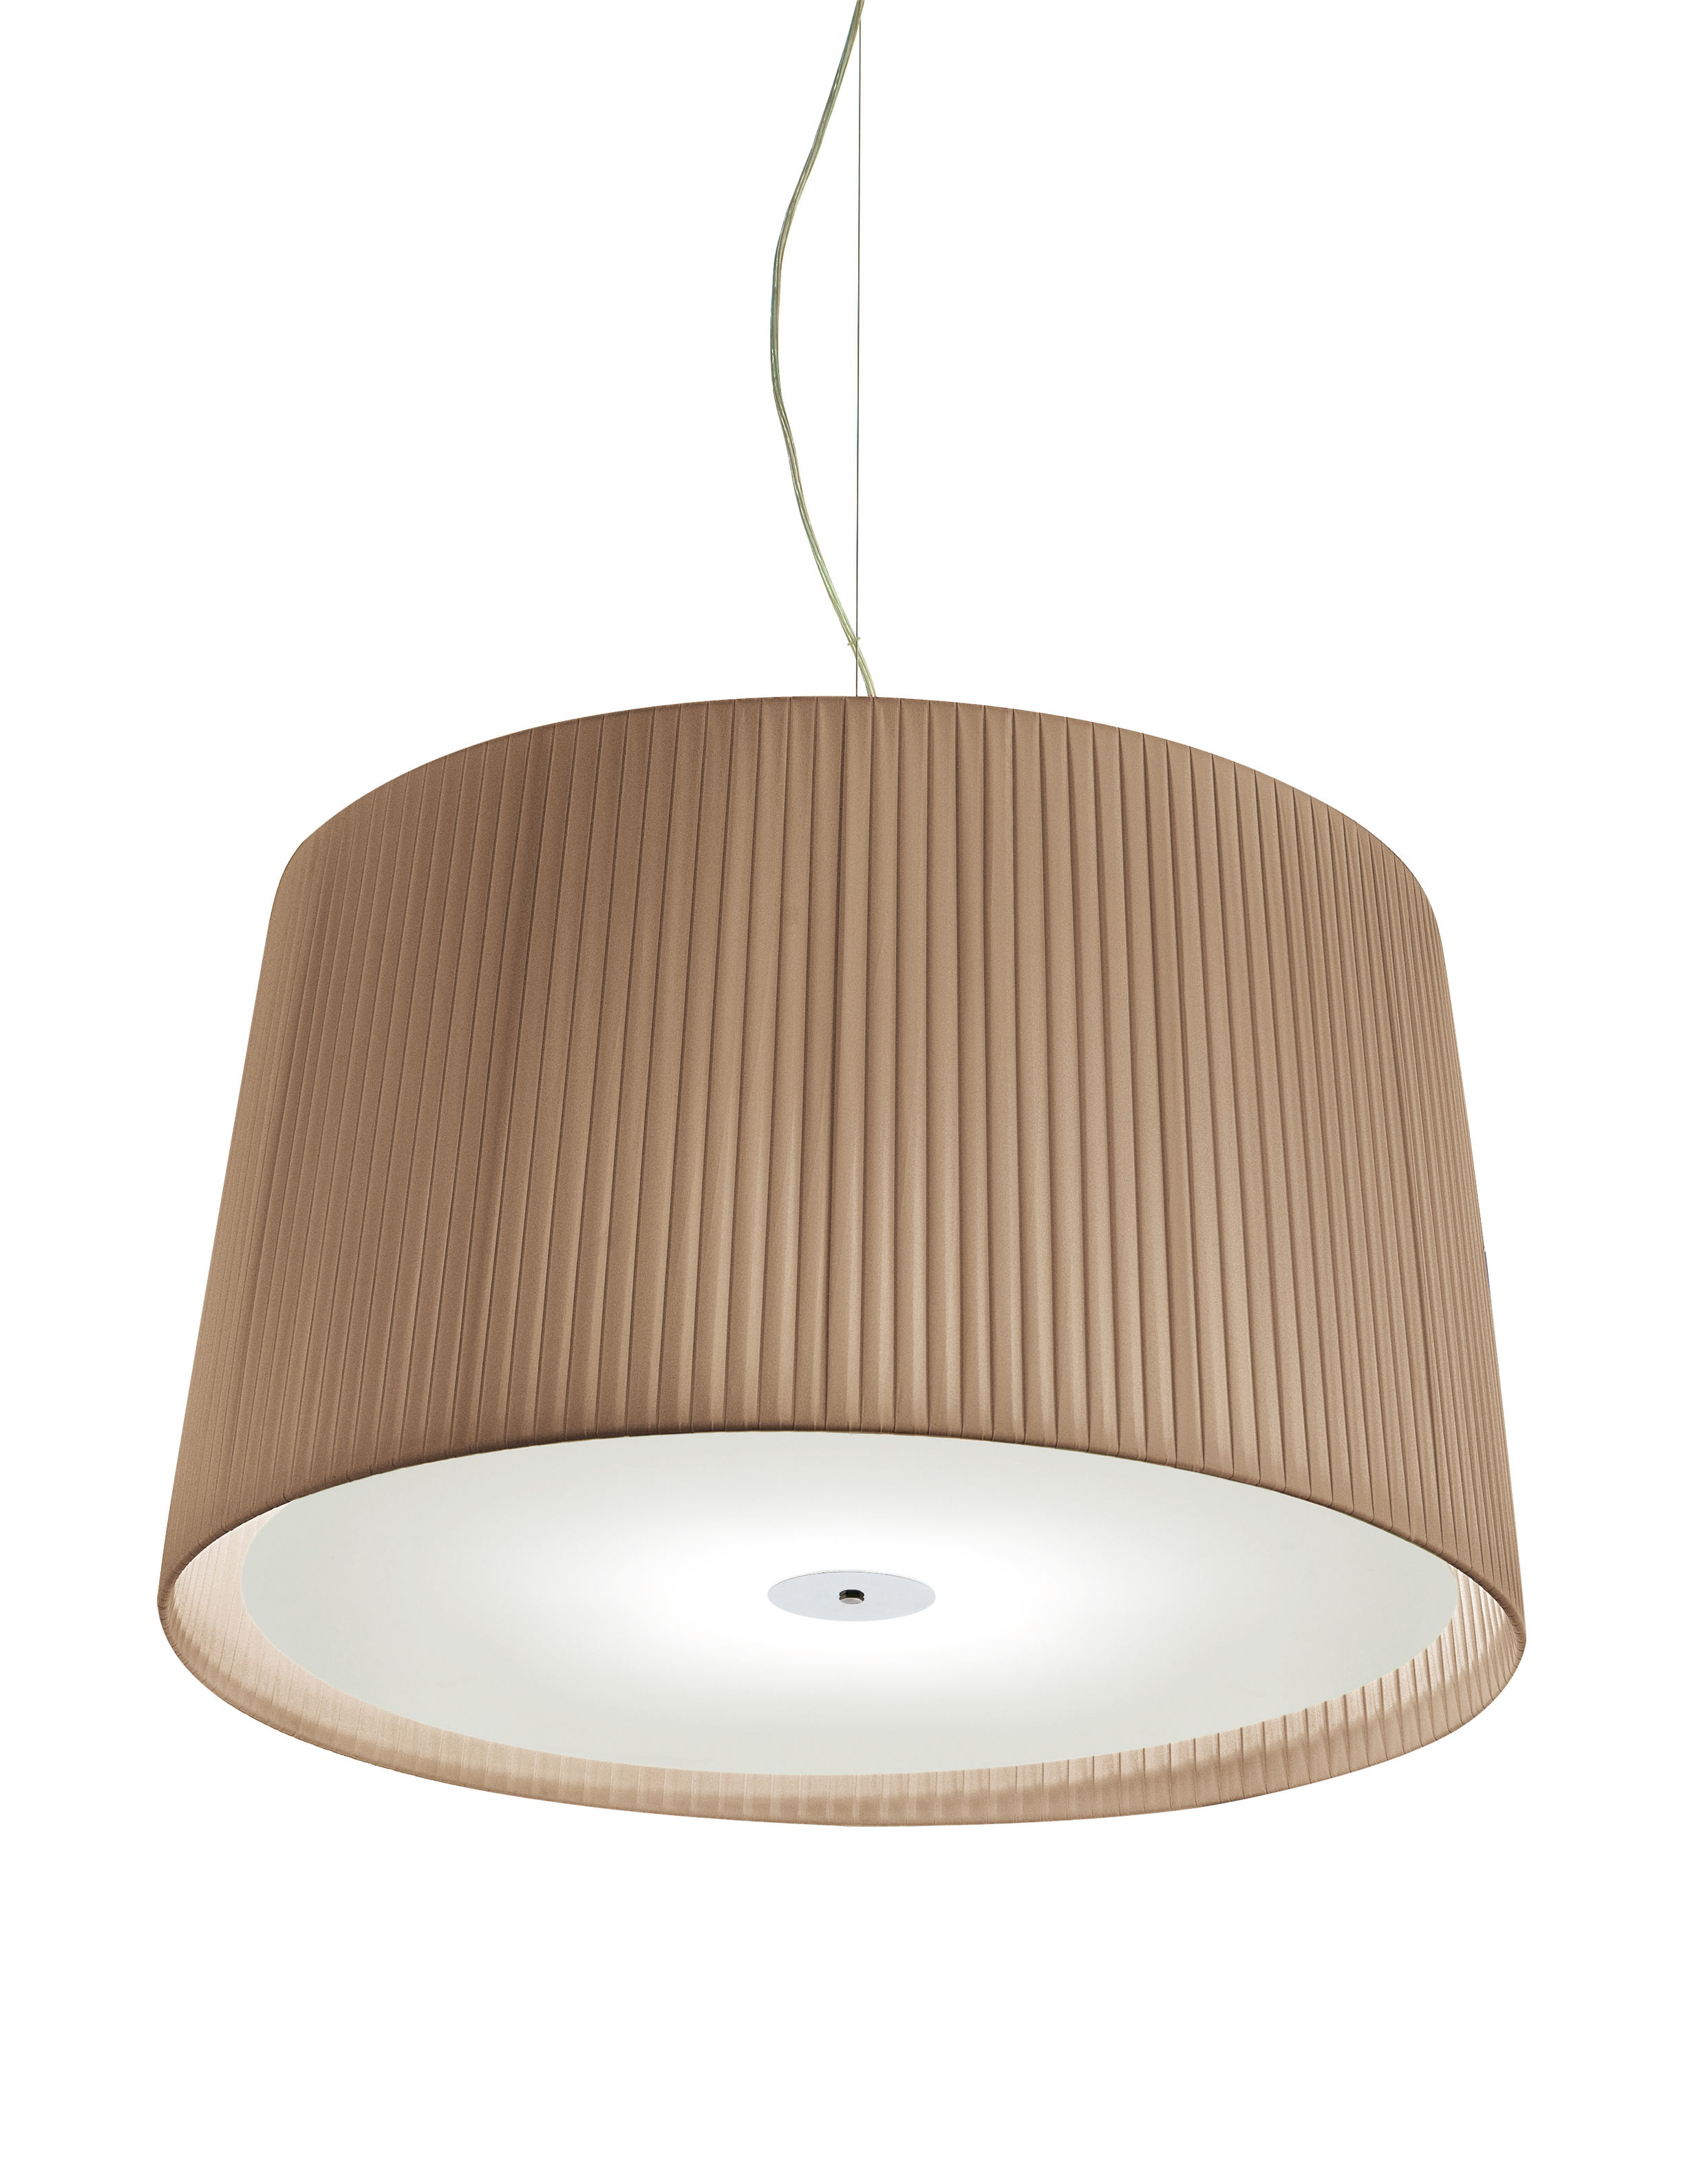 Luminaire - Suspensions - Suspension Milleluci / Ø 40 cm - Modoluce - Beige foncé - Coton, Plexiglas